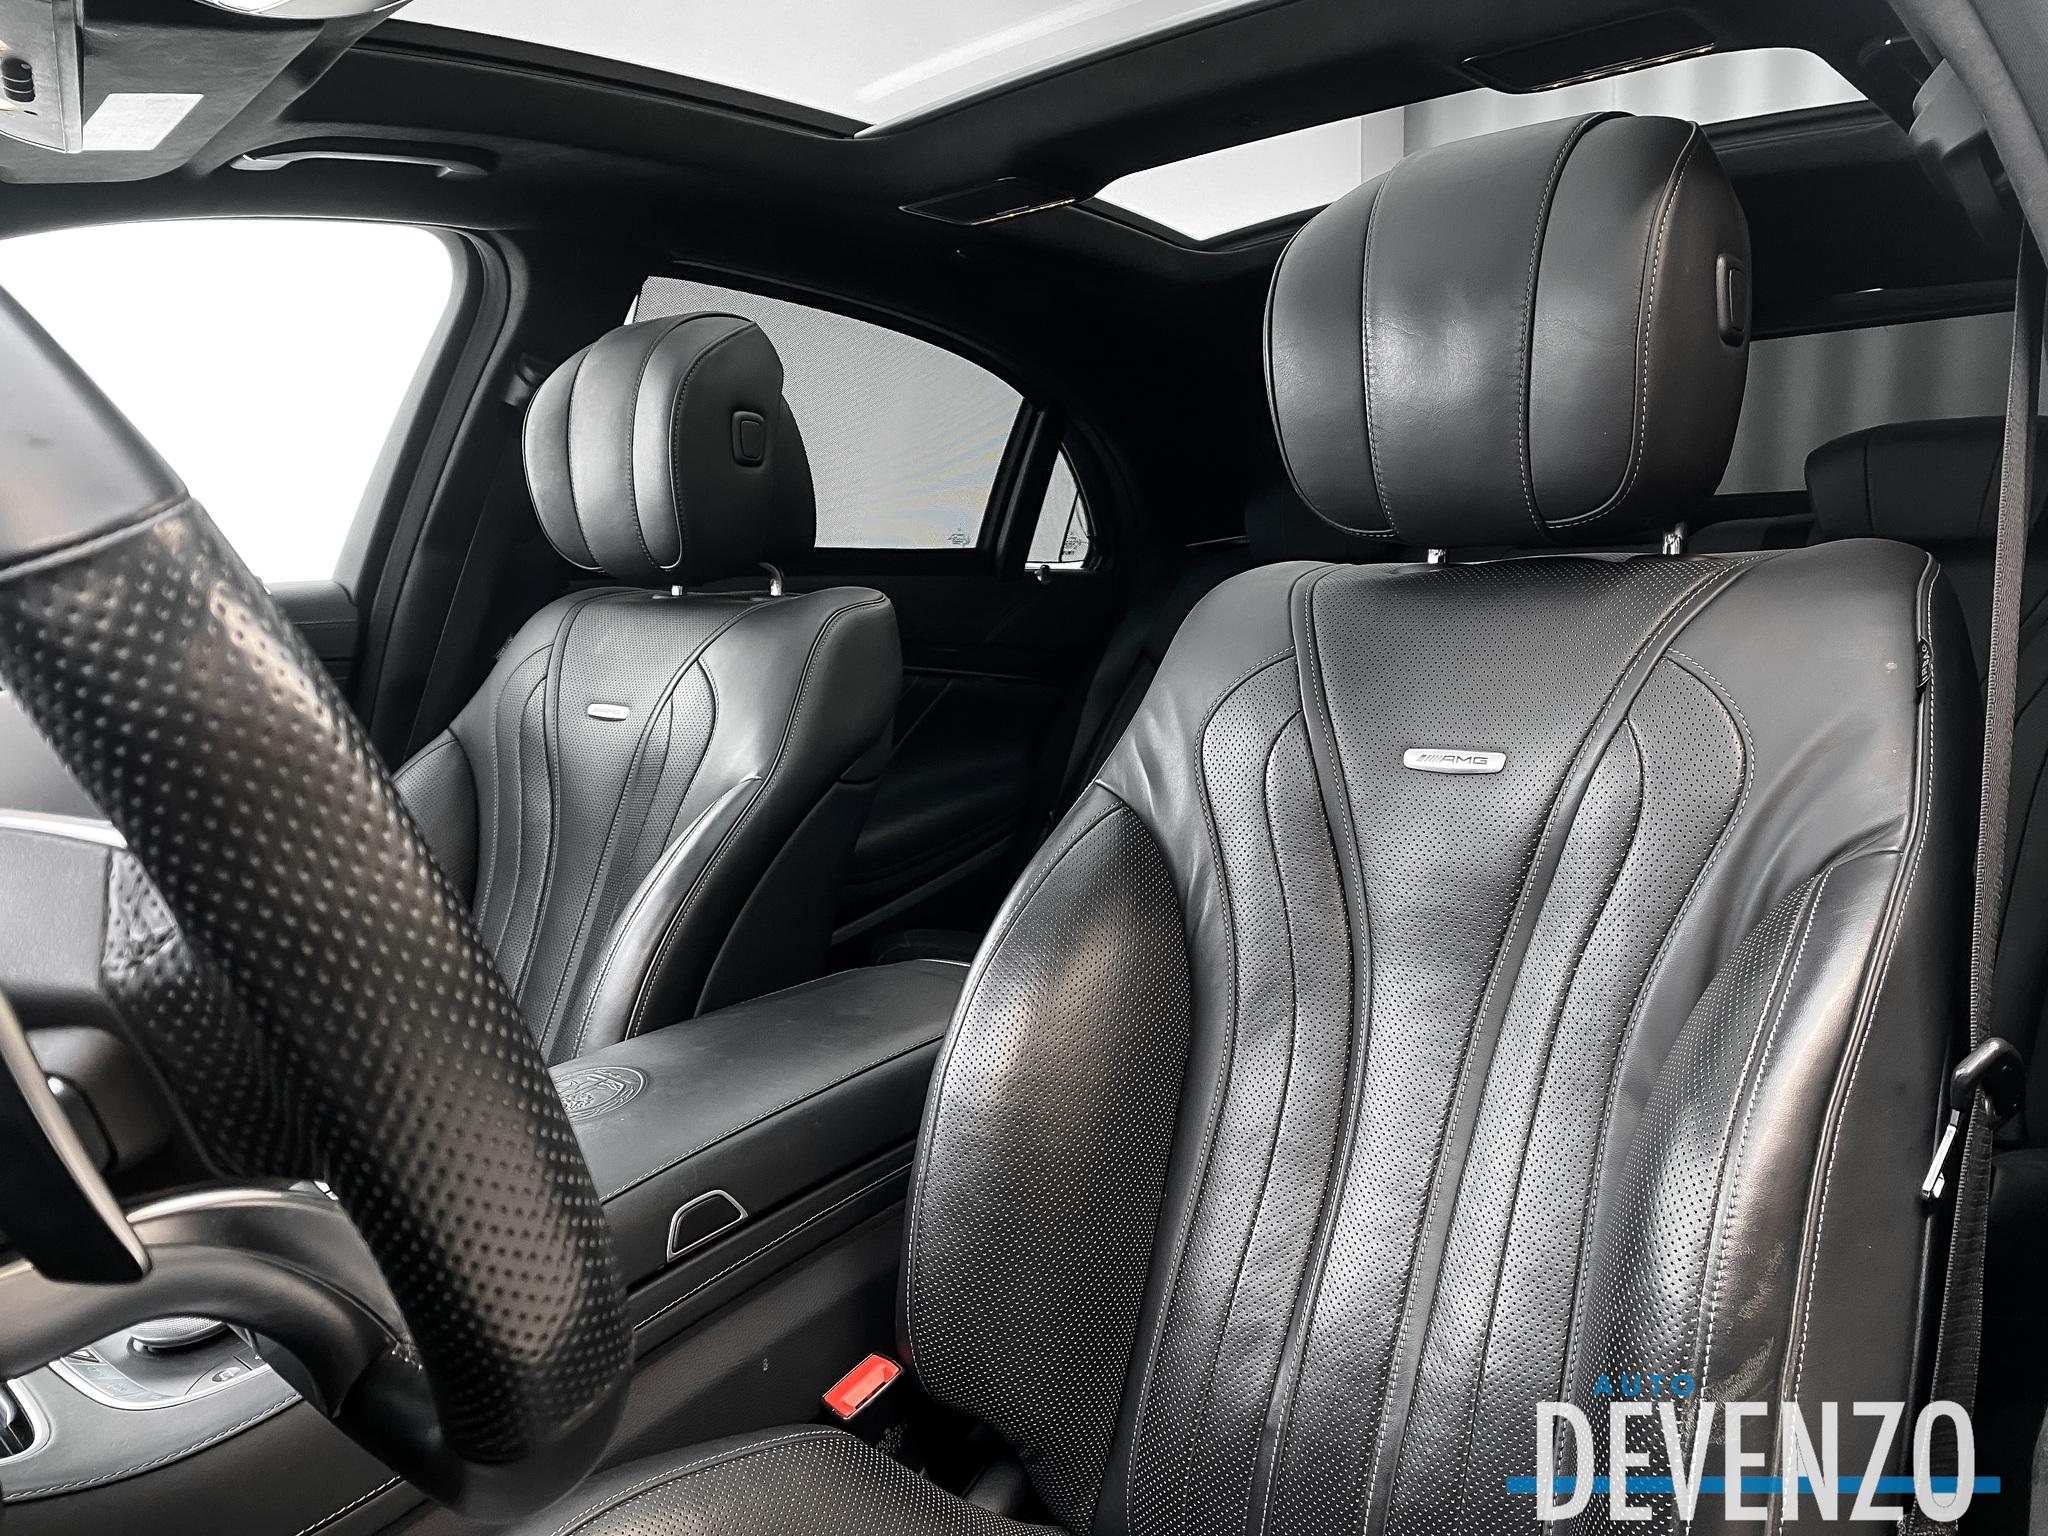 2017 Mercedes-Benz S-Class AMG S63 4MATIC DESIGNO MATT / NIGHT PACKAGE complet